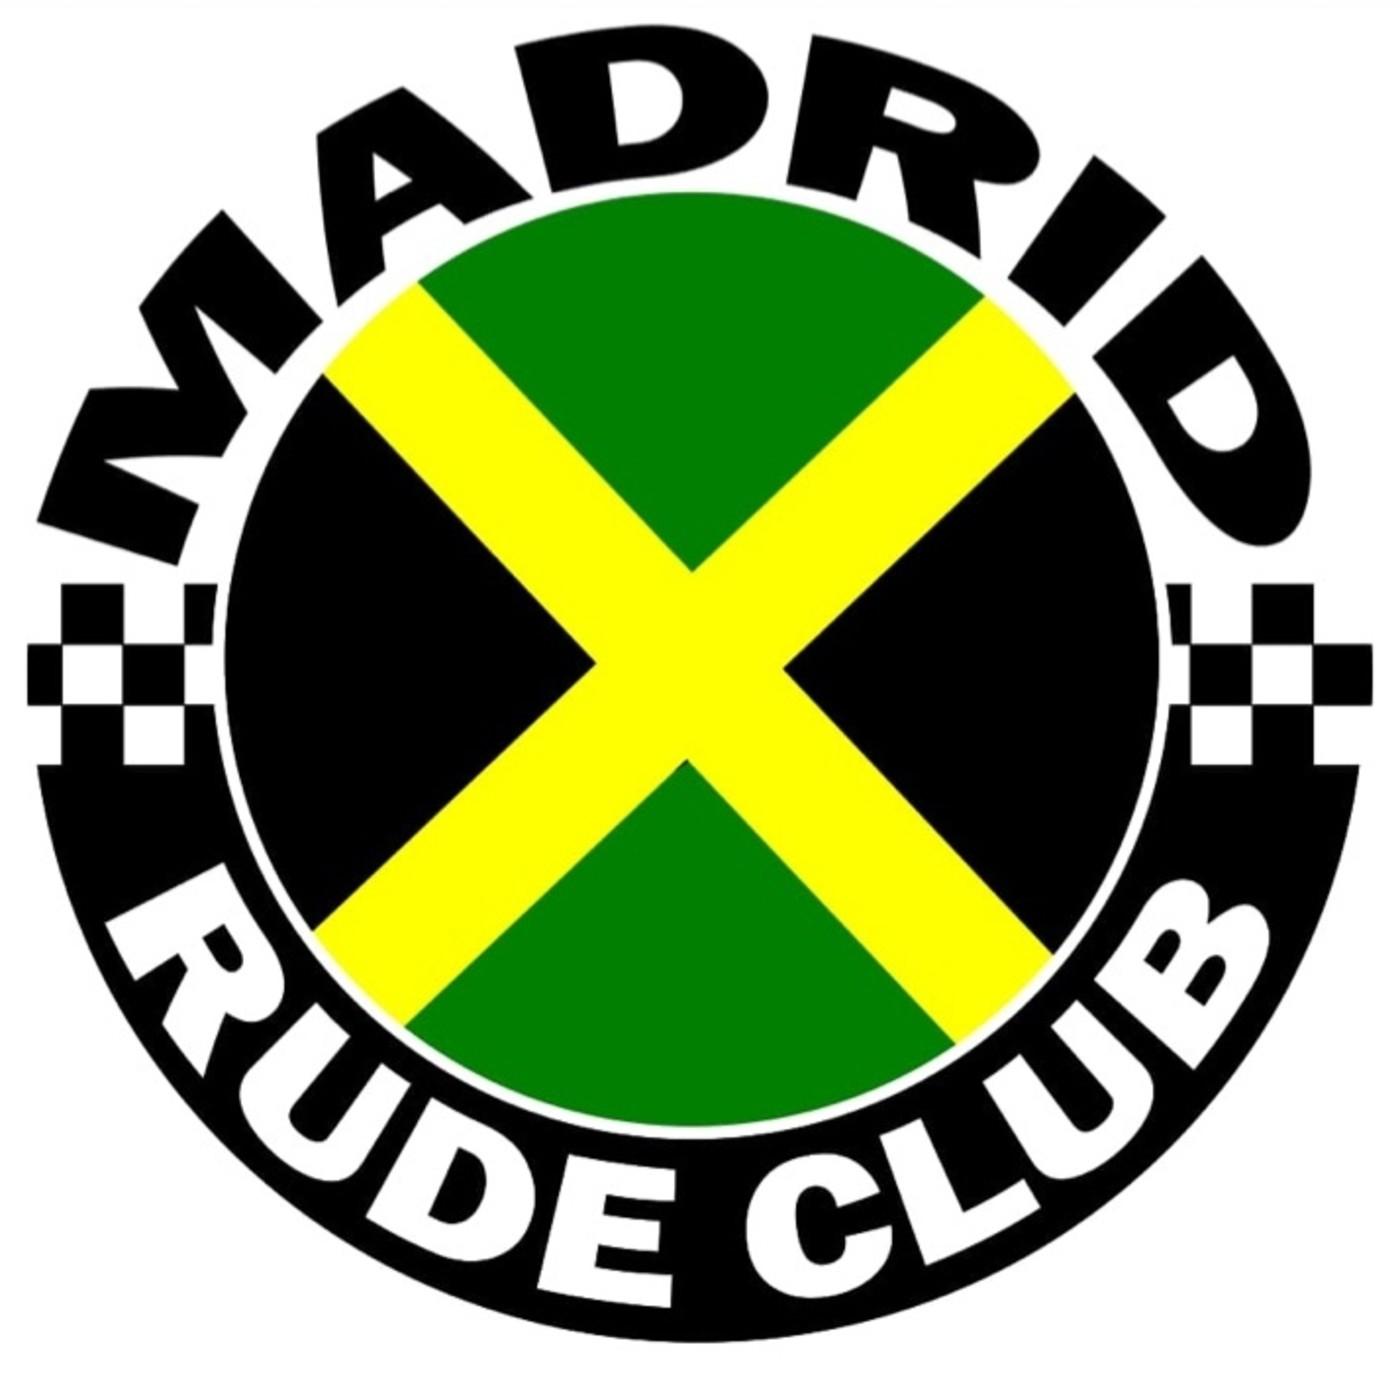 Madrid Rude Club